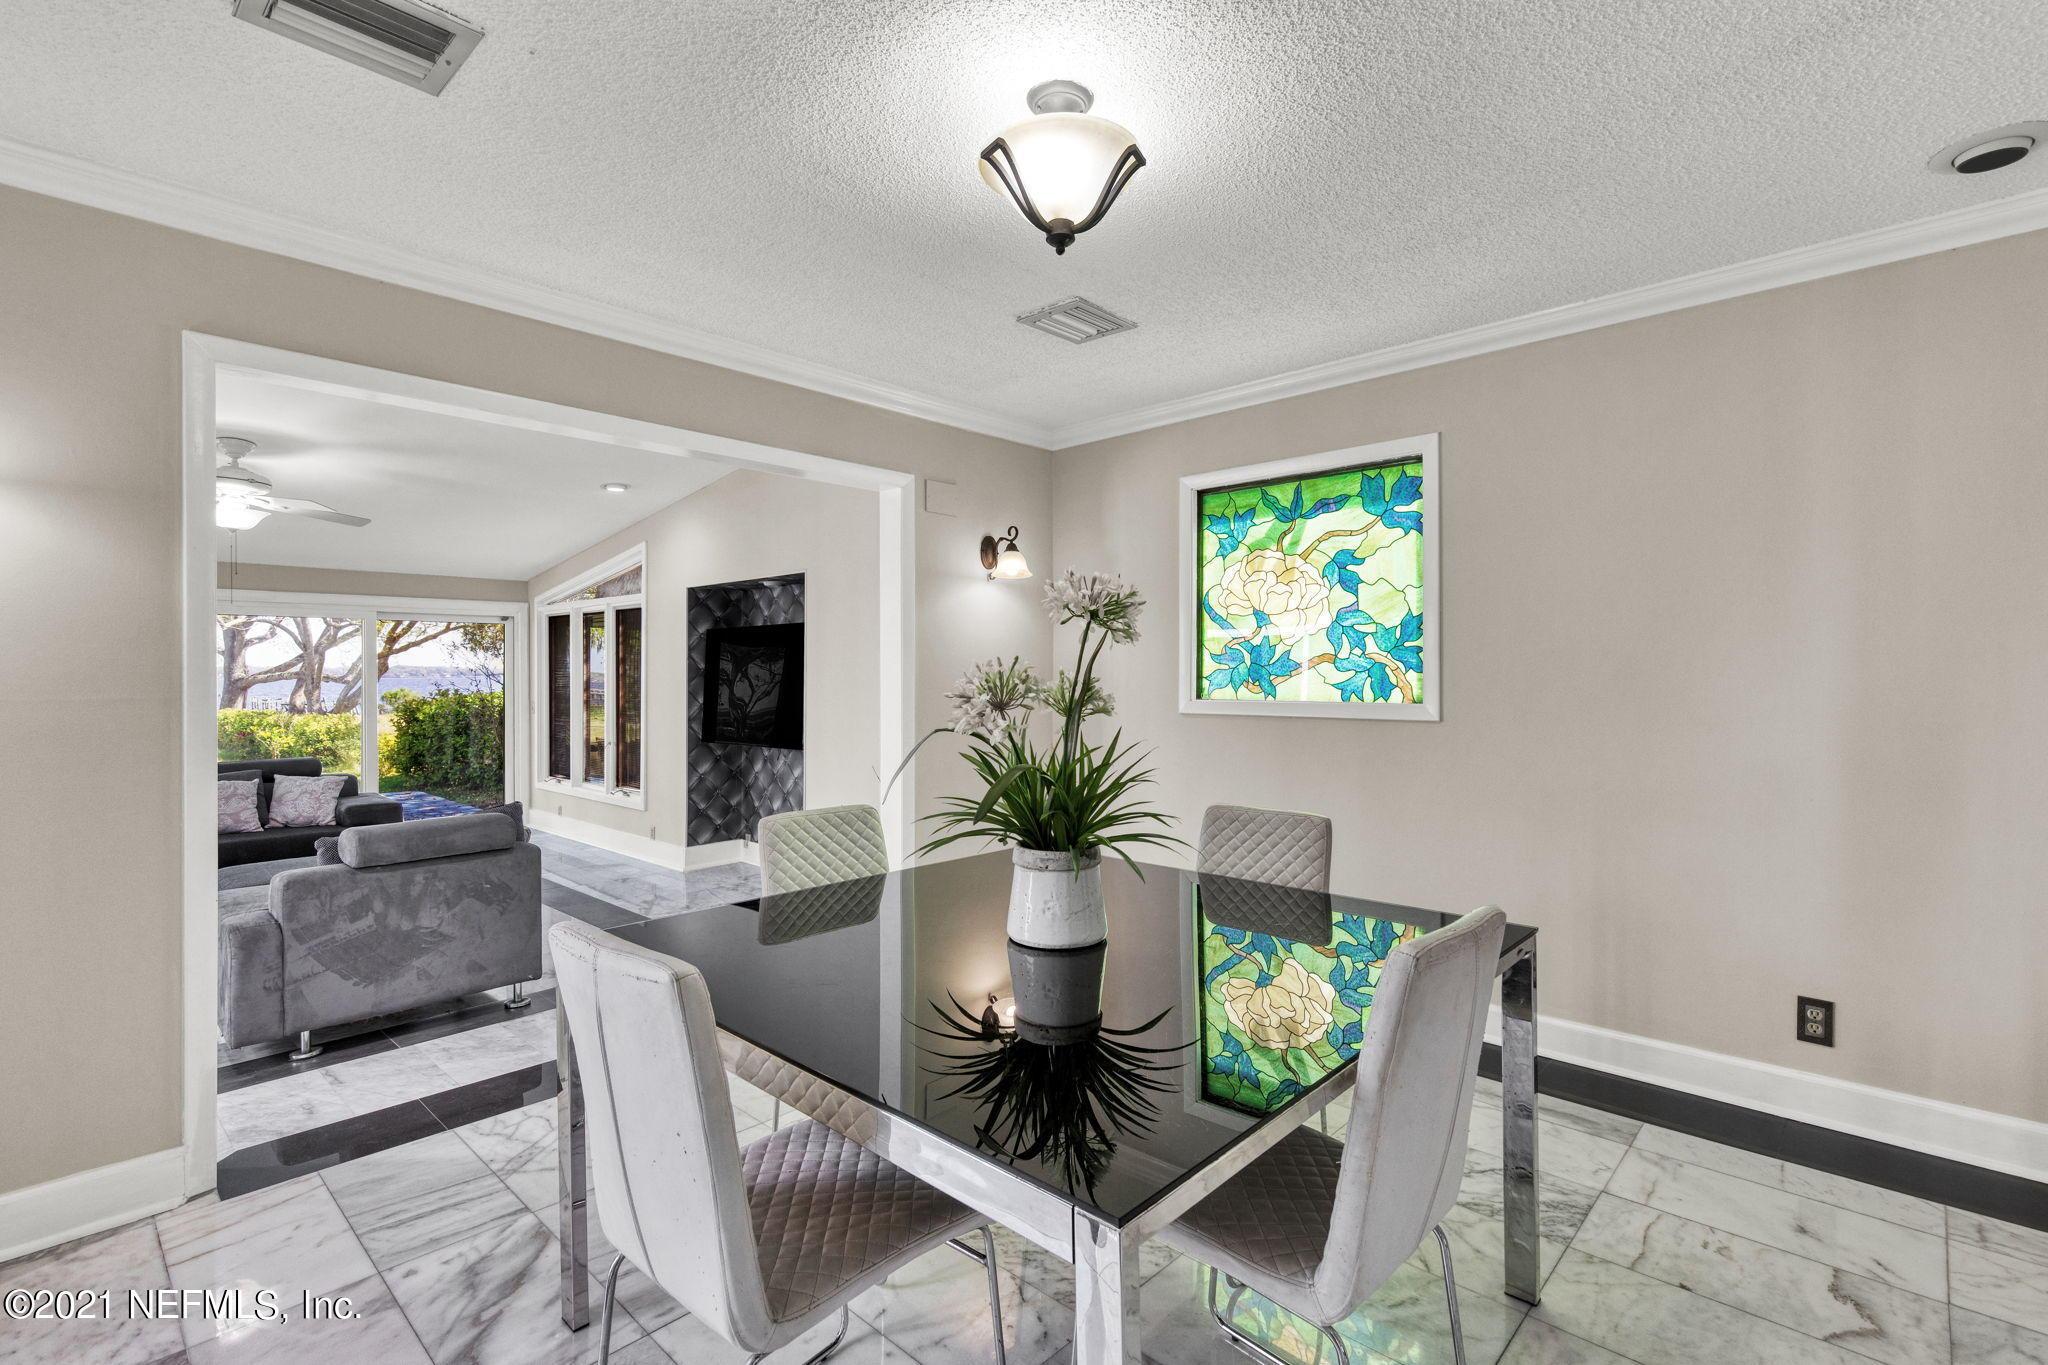 3647 WESTOVER, ORANGE PARK, FLORIDA 32003, 5 Bedrooms Bedrooms, ,7 BathroomsBathrooms,Residential,For sale,WESTOVER,1095600